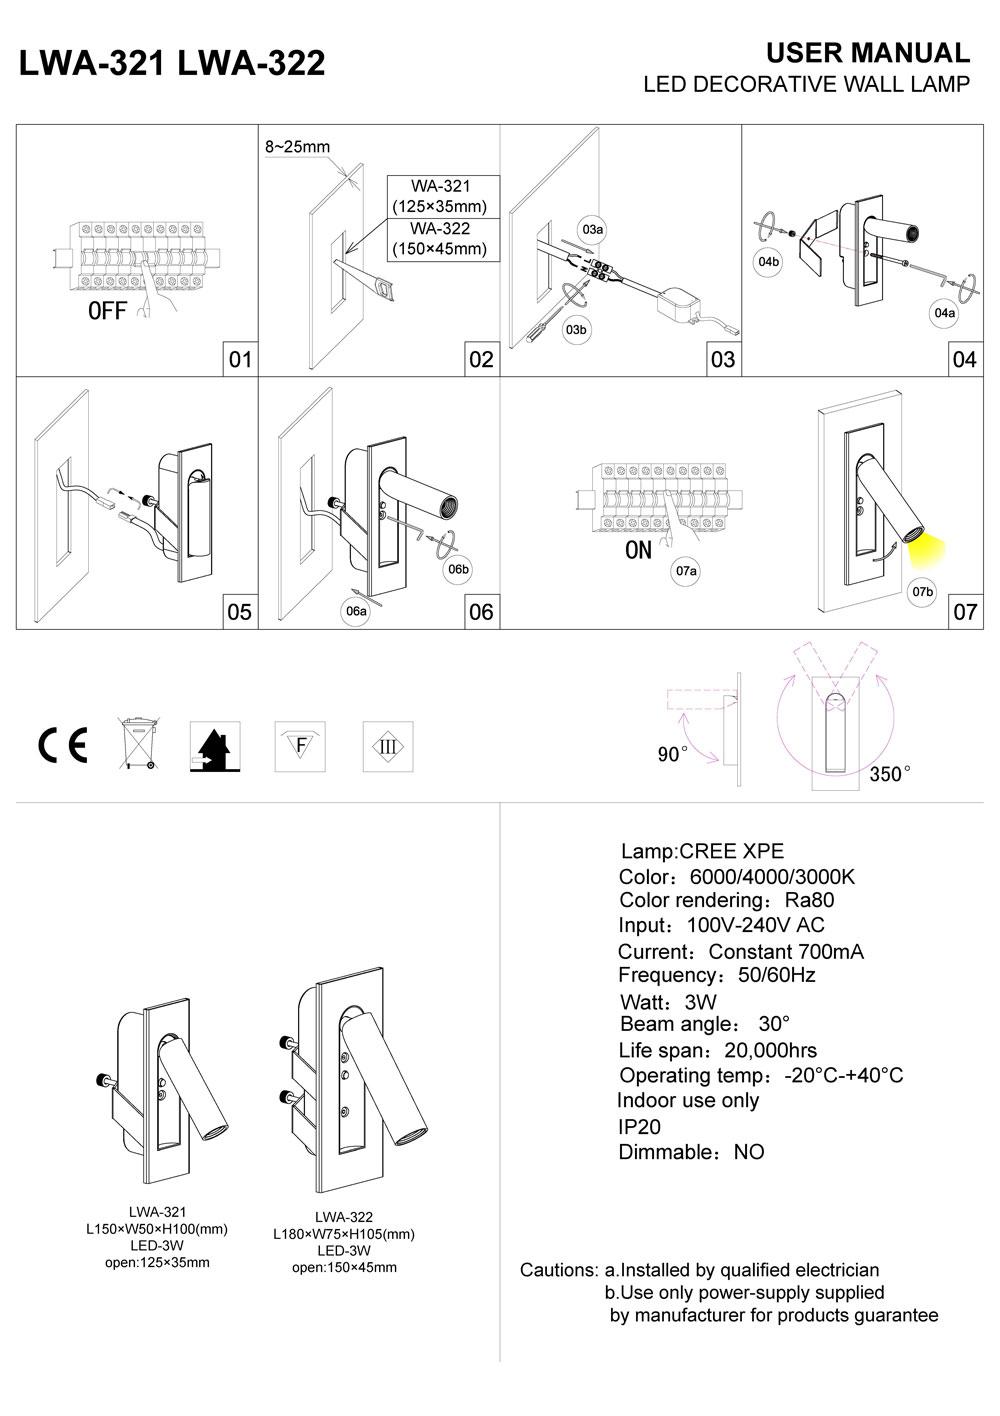 LWA322 LED reading light installation guide